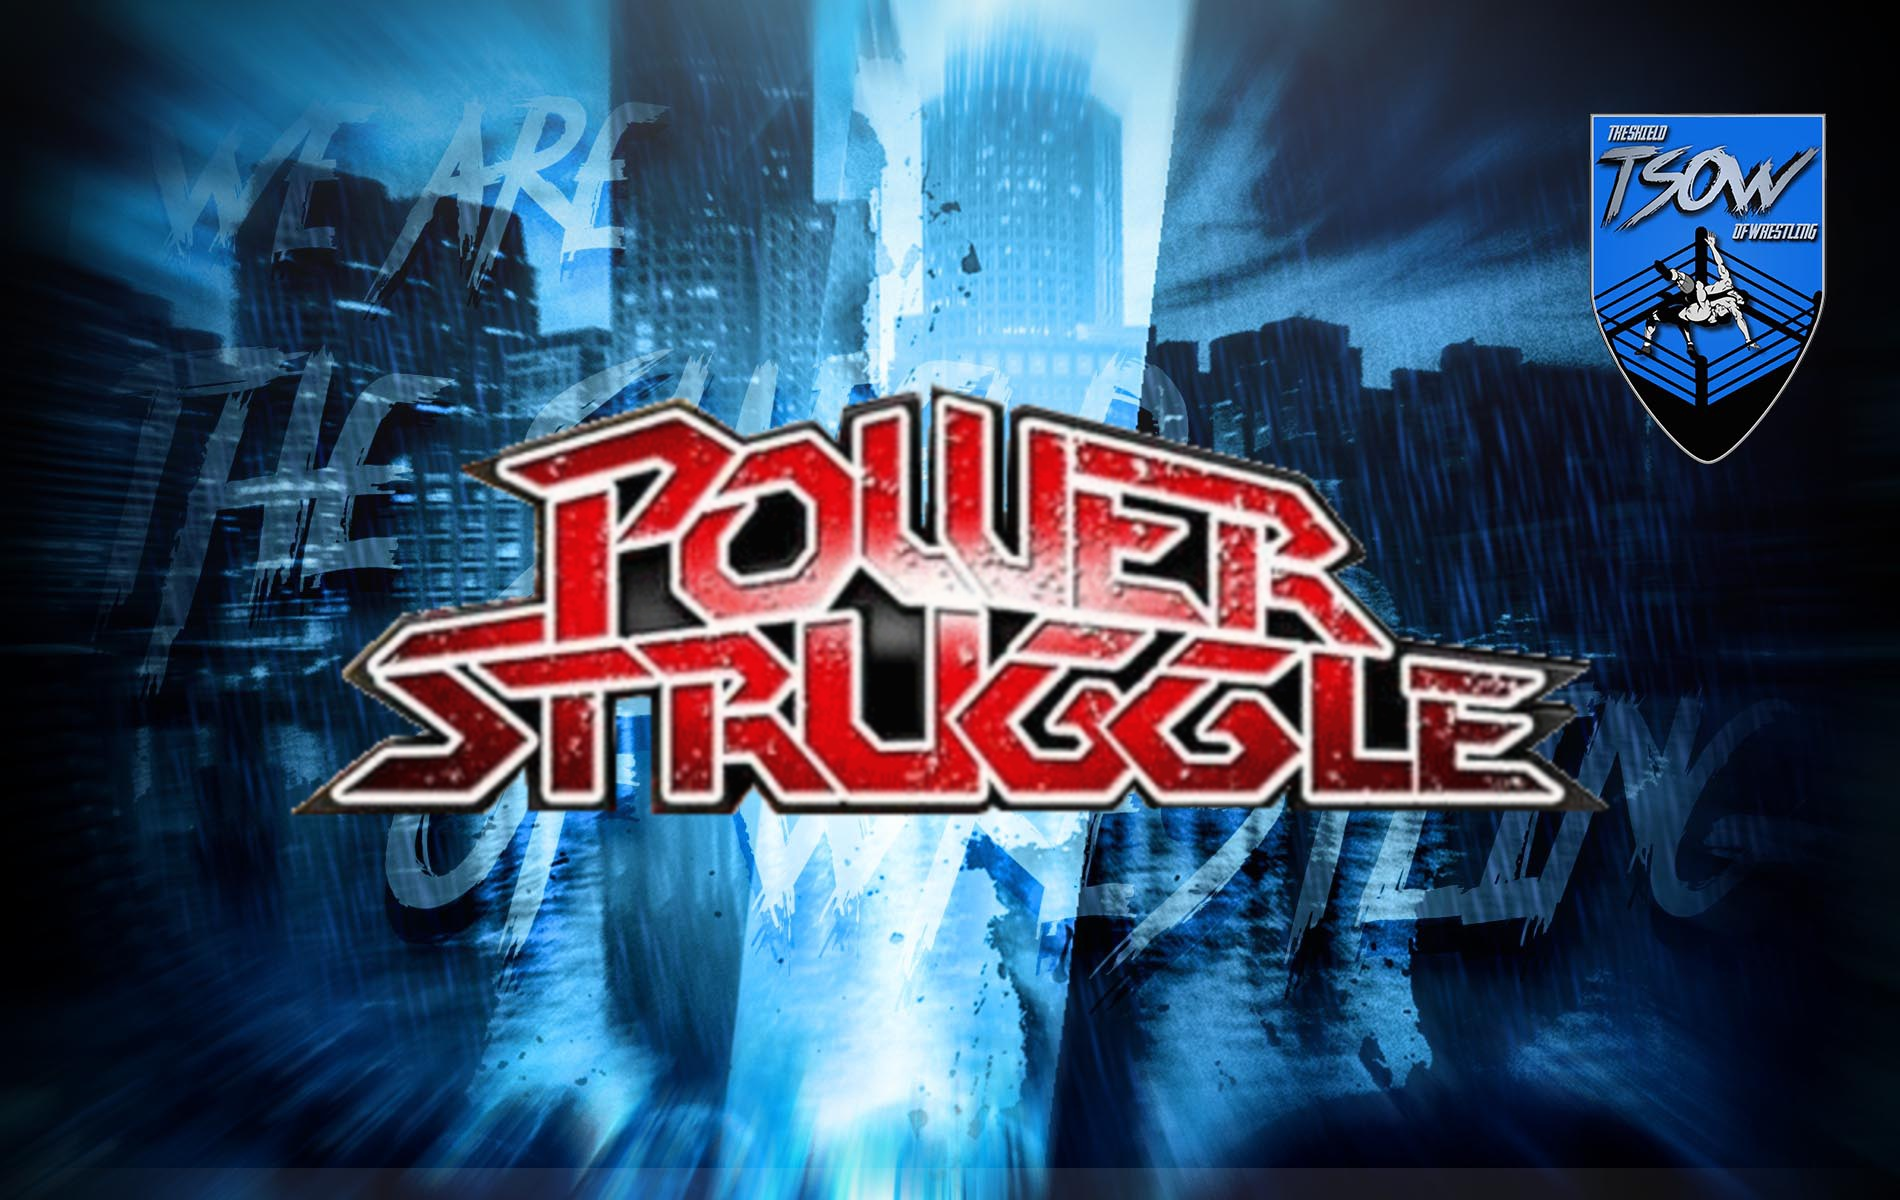 Risultati NJPW Road To Power Struggle 2020 - Day 4